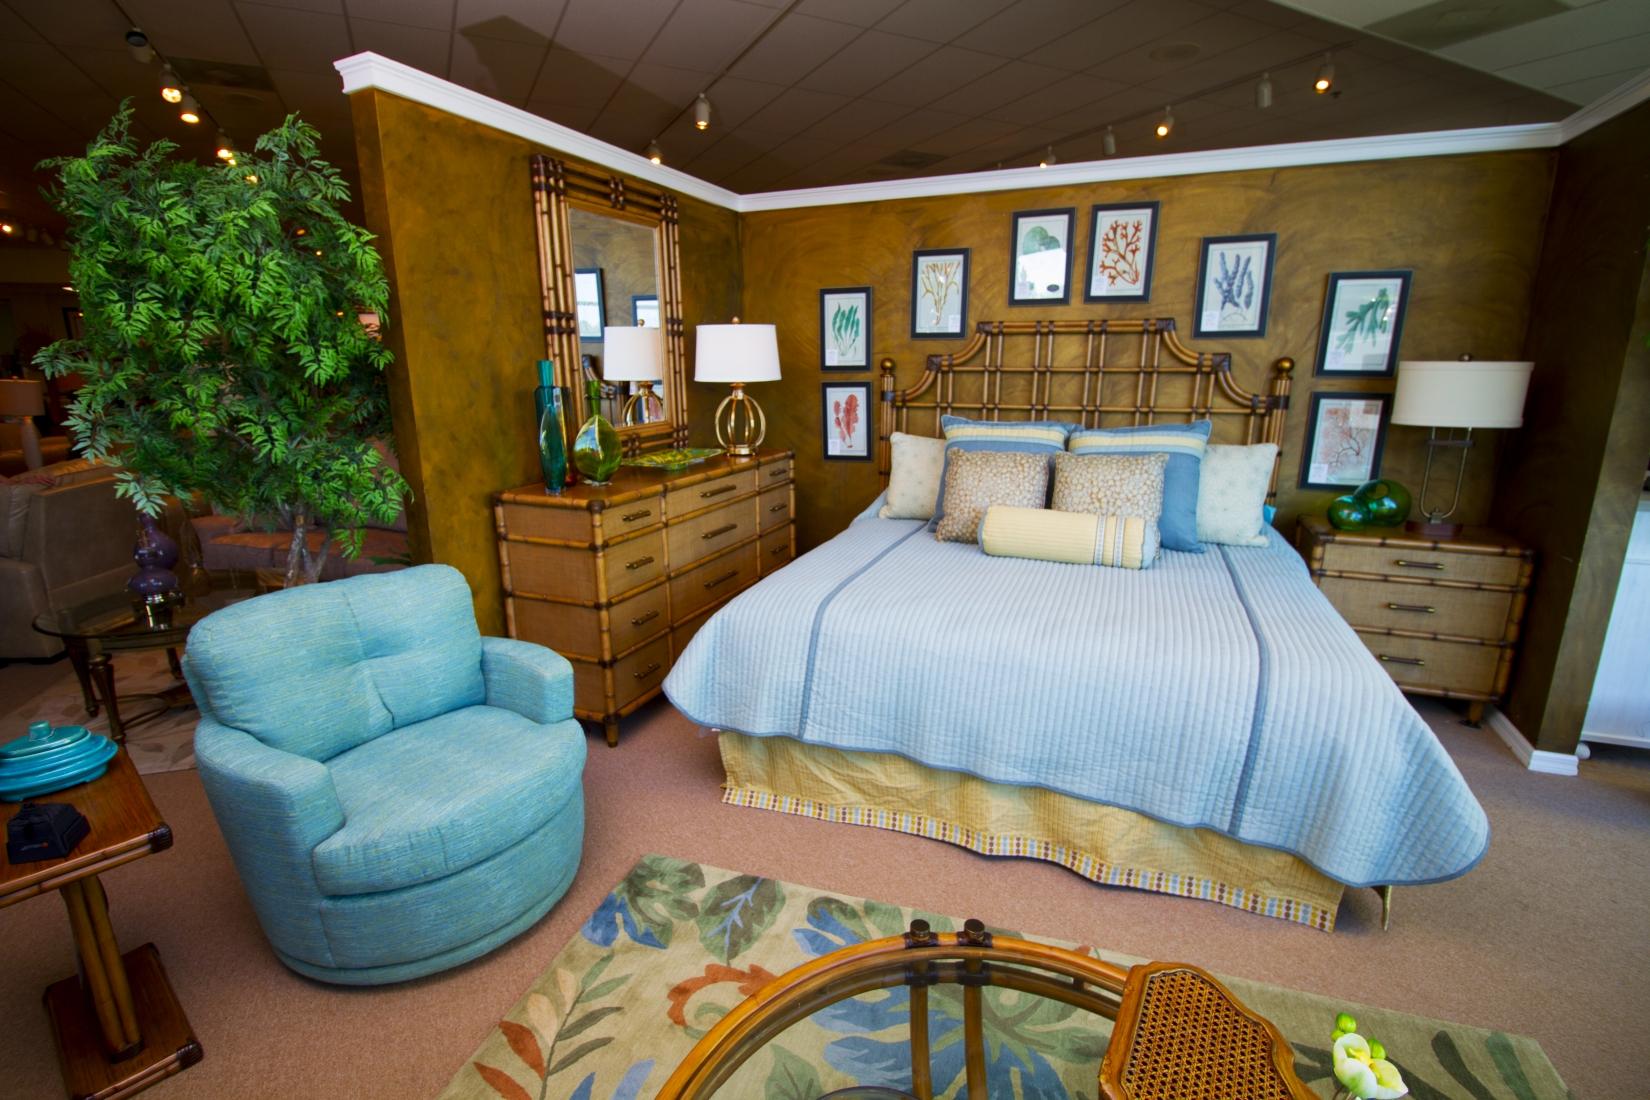 White S Furniture Accessories 13970 South Us Highway 441 Summerfield Fl 34491 352 245 8400